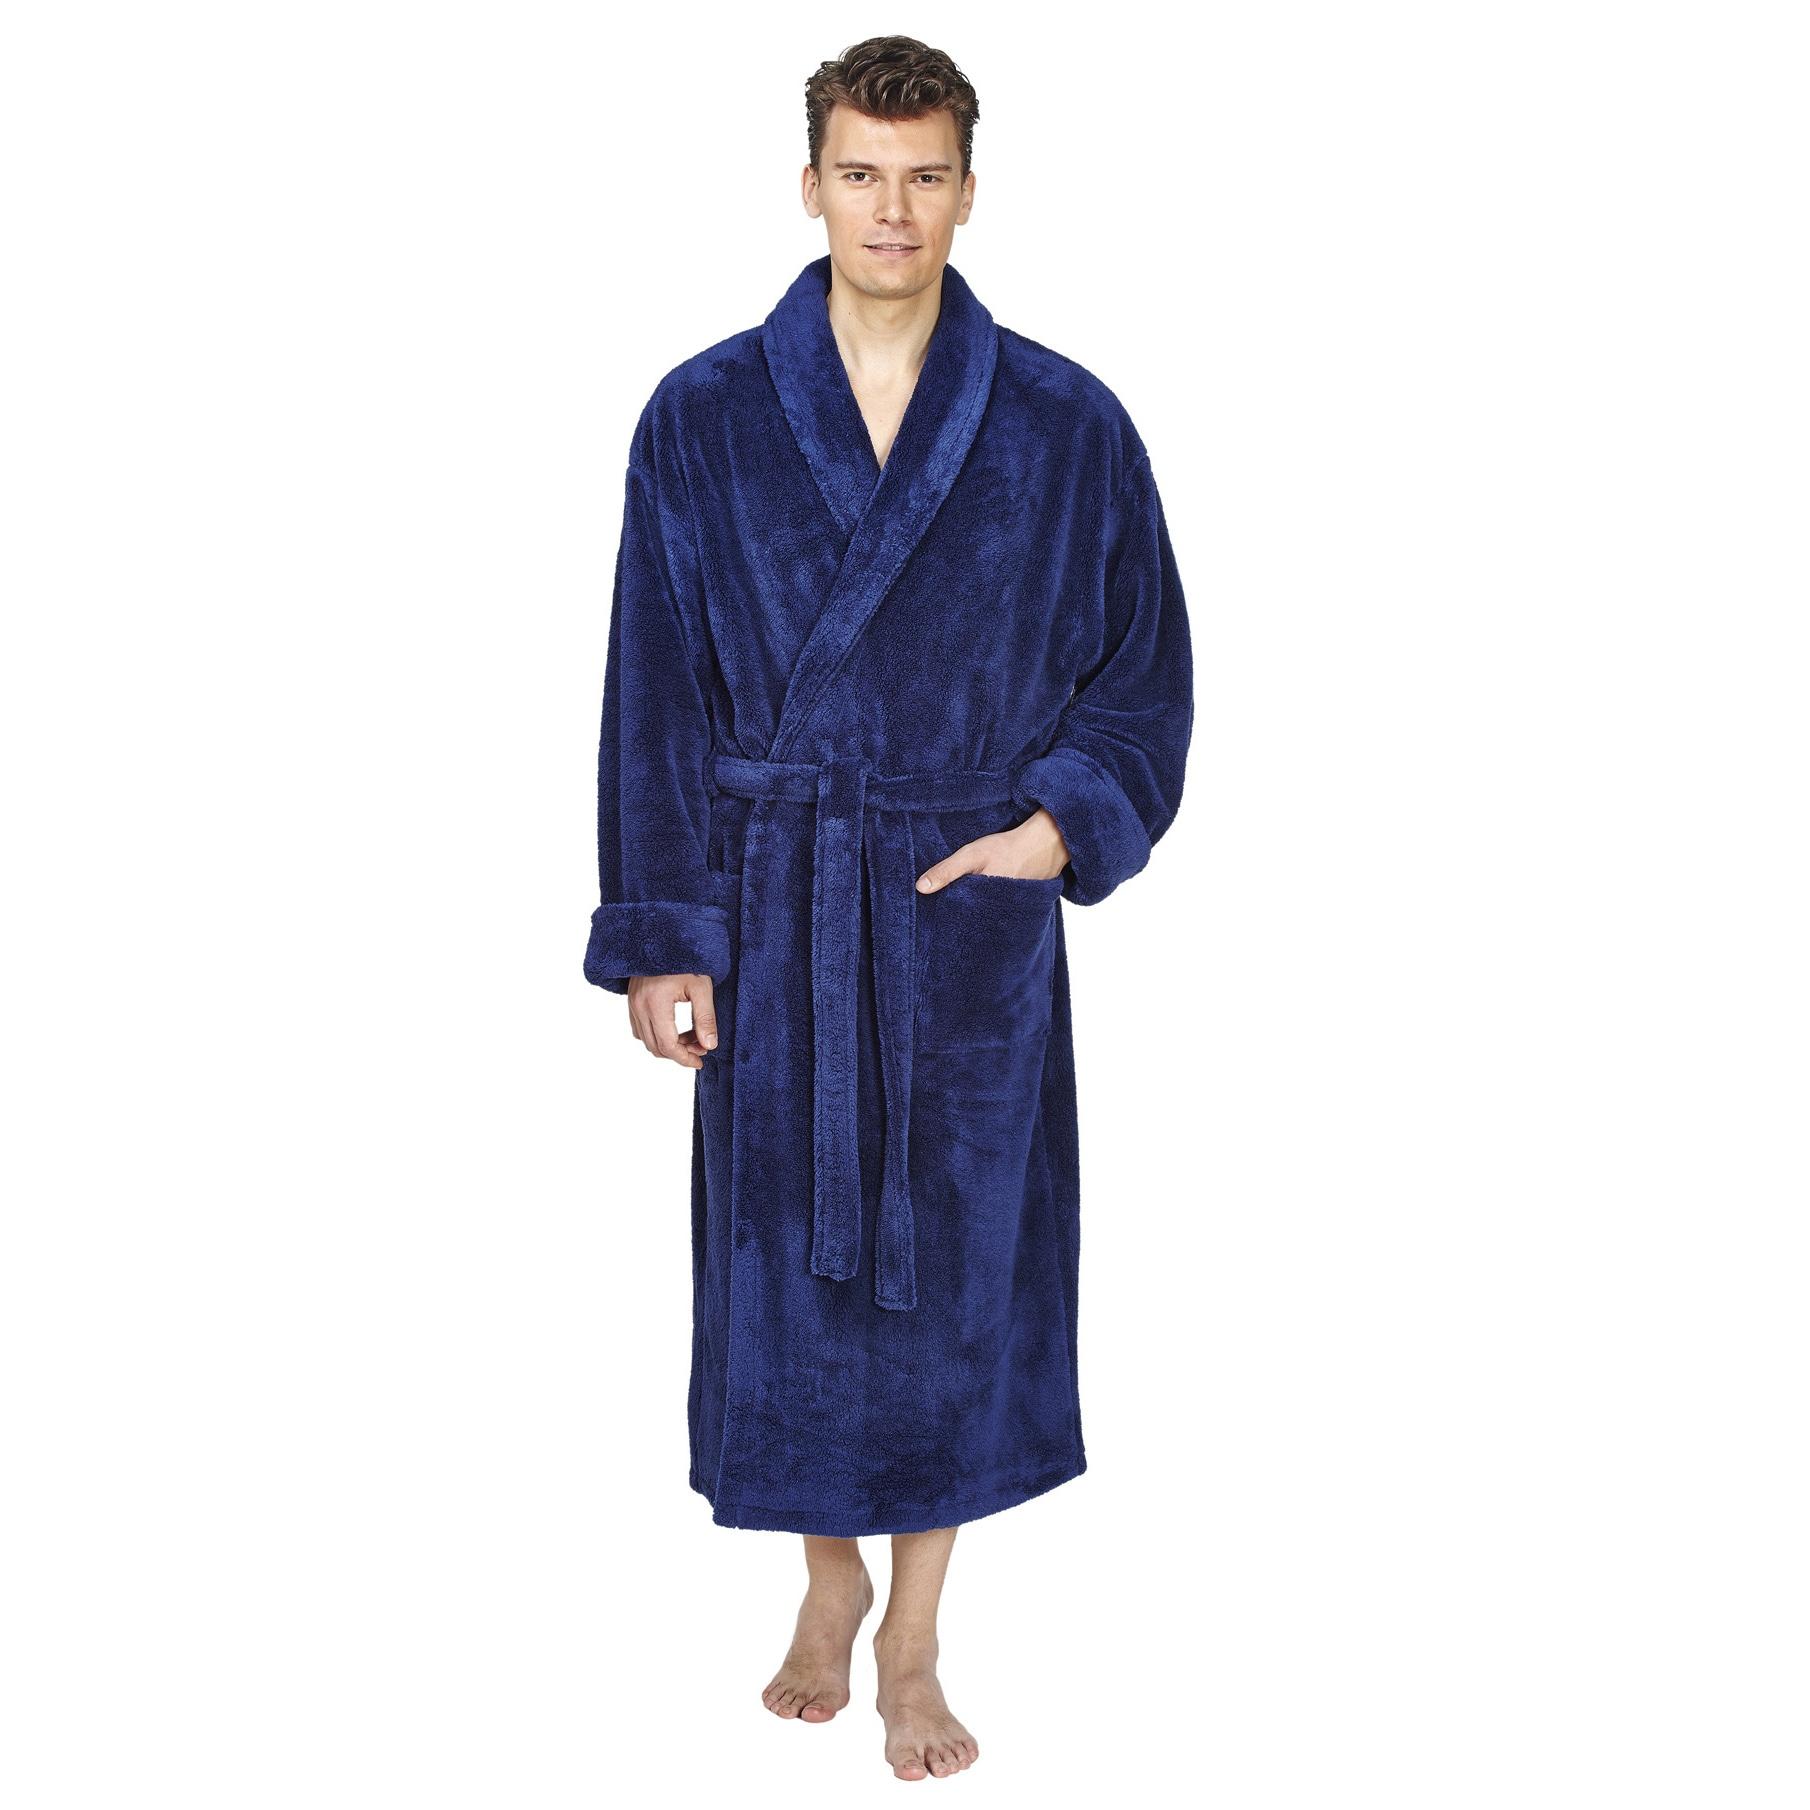 Shop Men s Shawl Fleece Bathrobe Turkish Soft Plush Robe - Free Shipping  Today - Overstock - 14387006 ead18be80